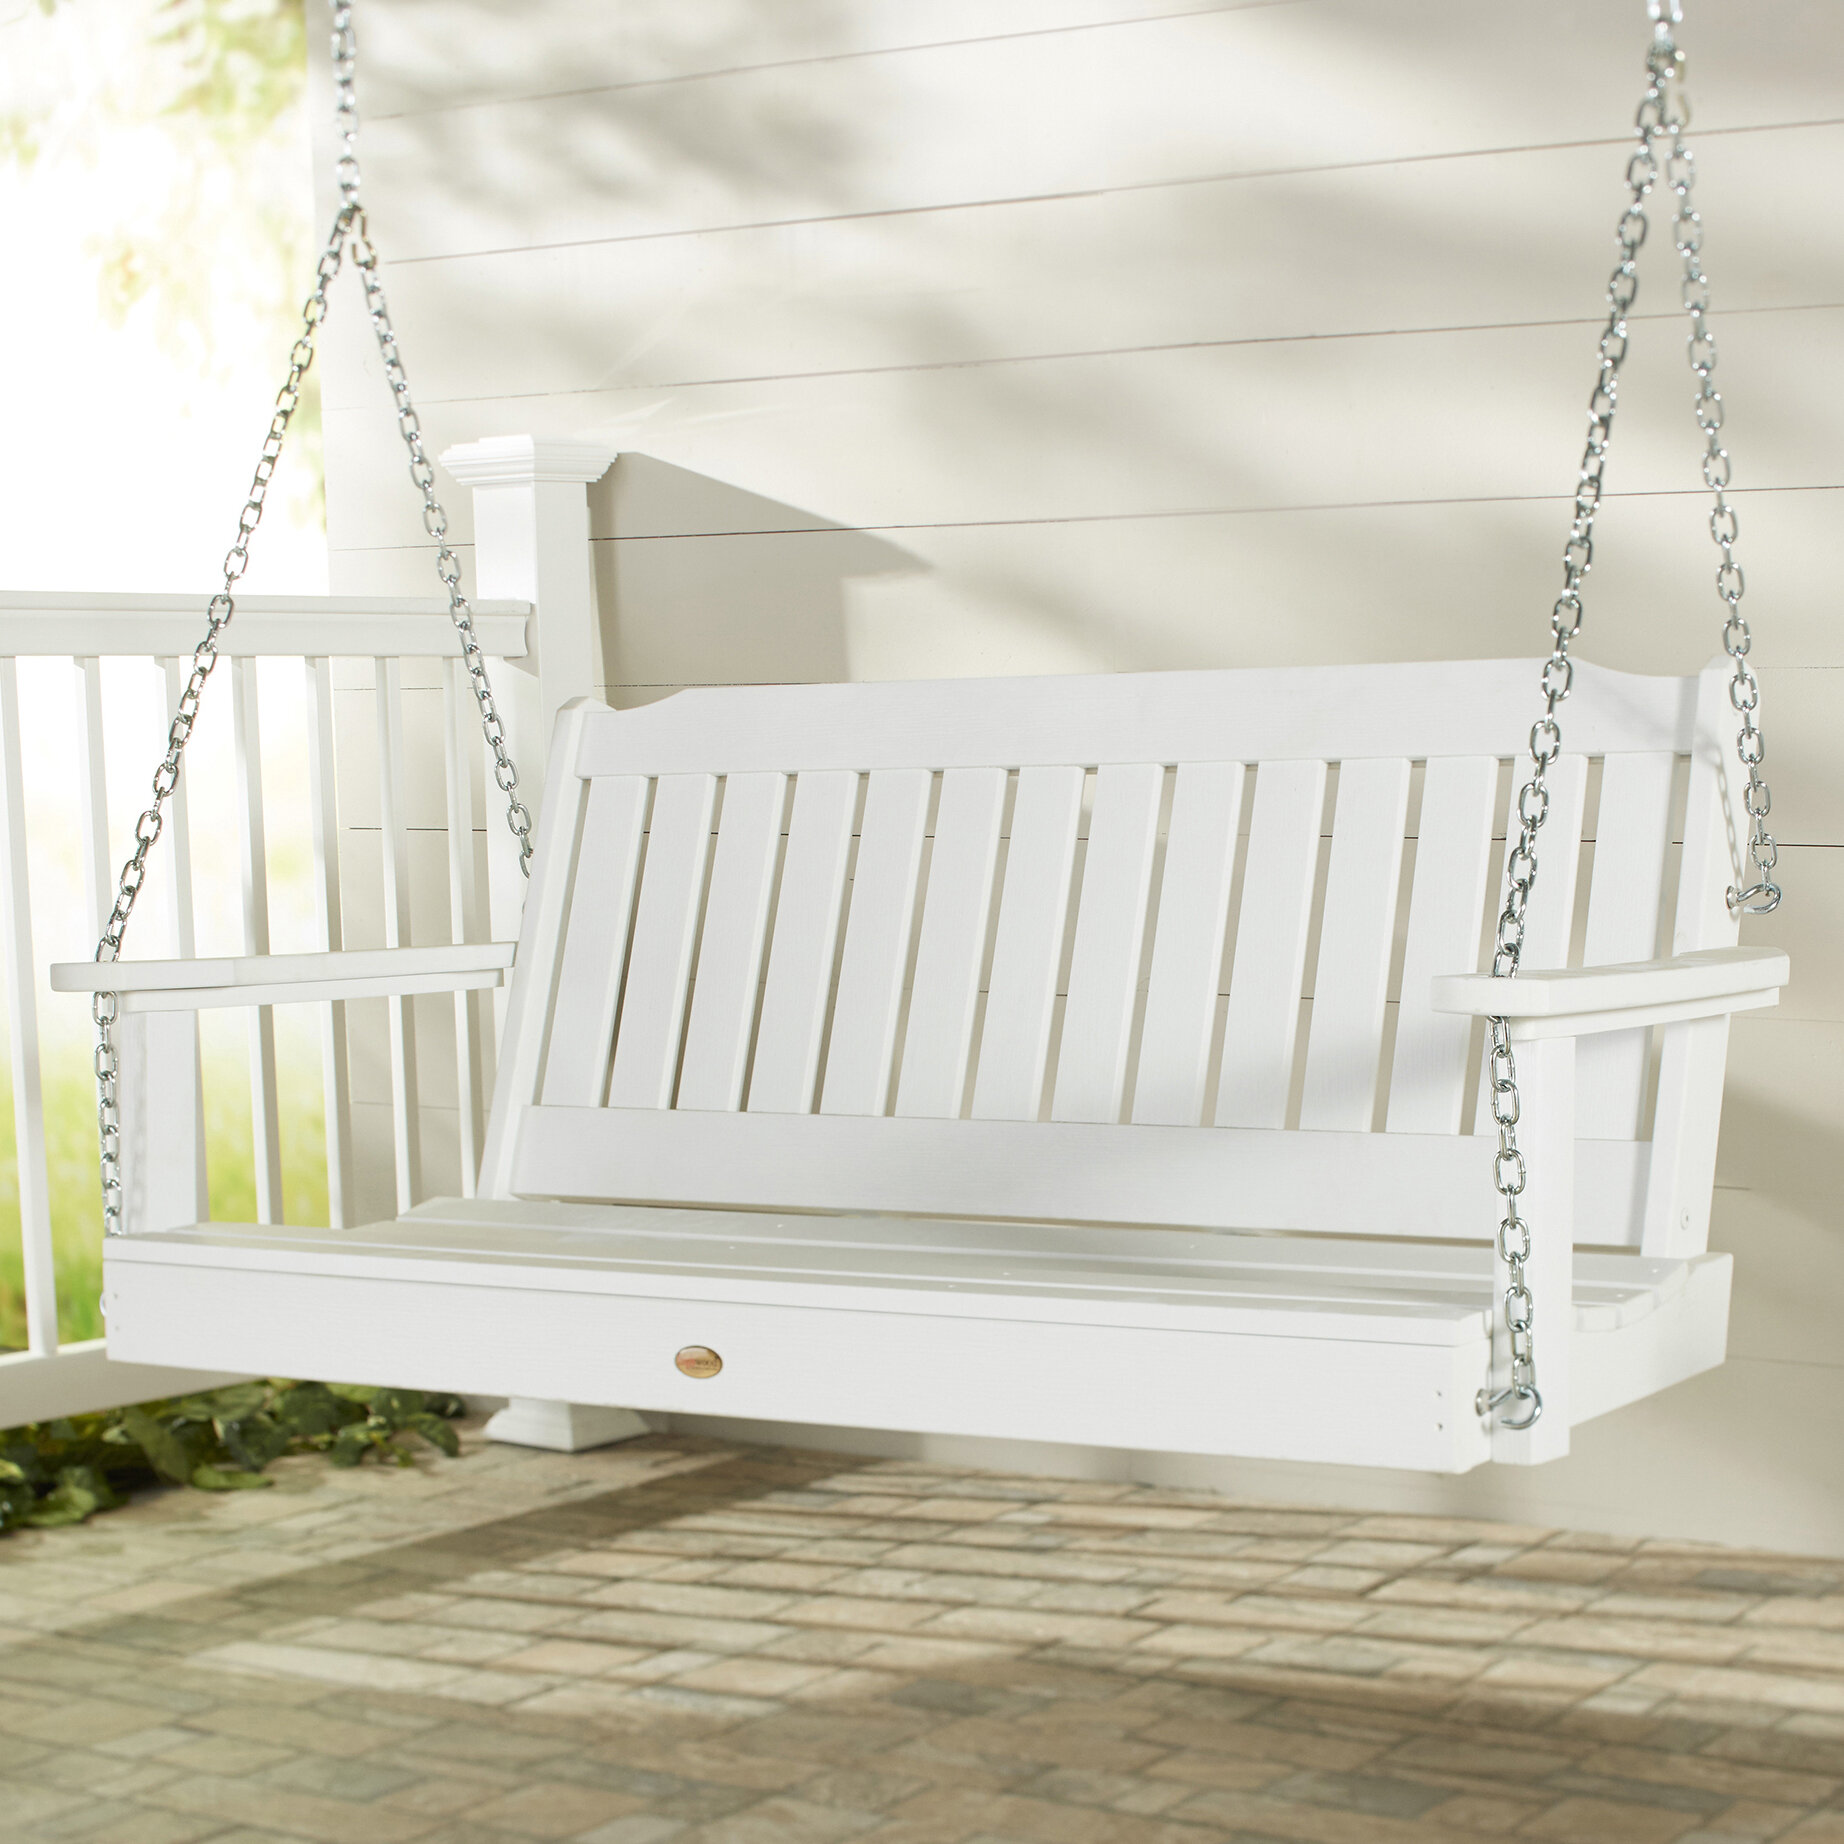 design diy mymydiy blueprints inspiring free plans porch swing